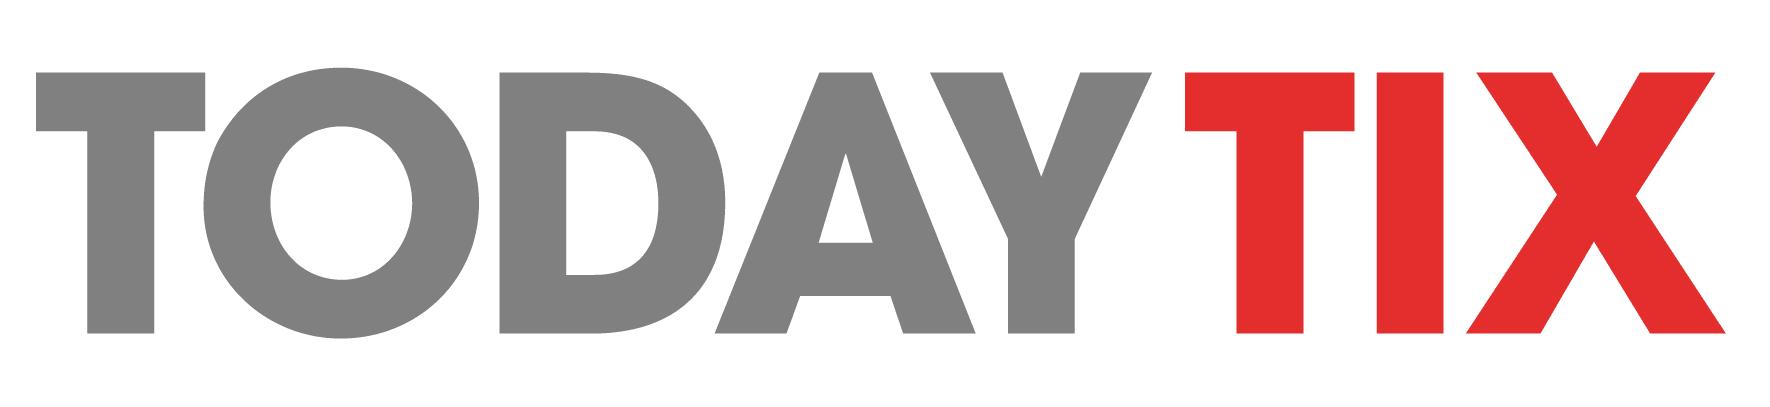 TodayTix Logo 2018 pfdxuz